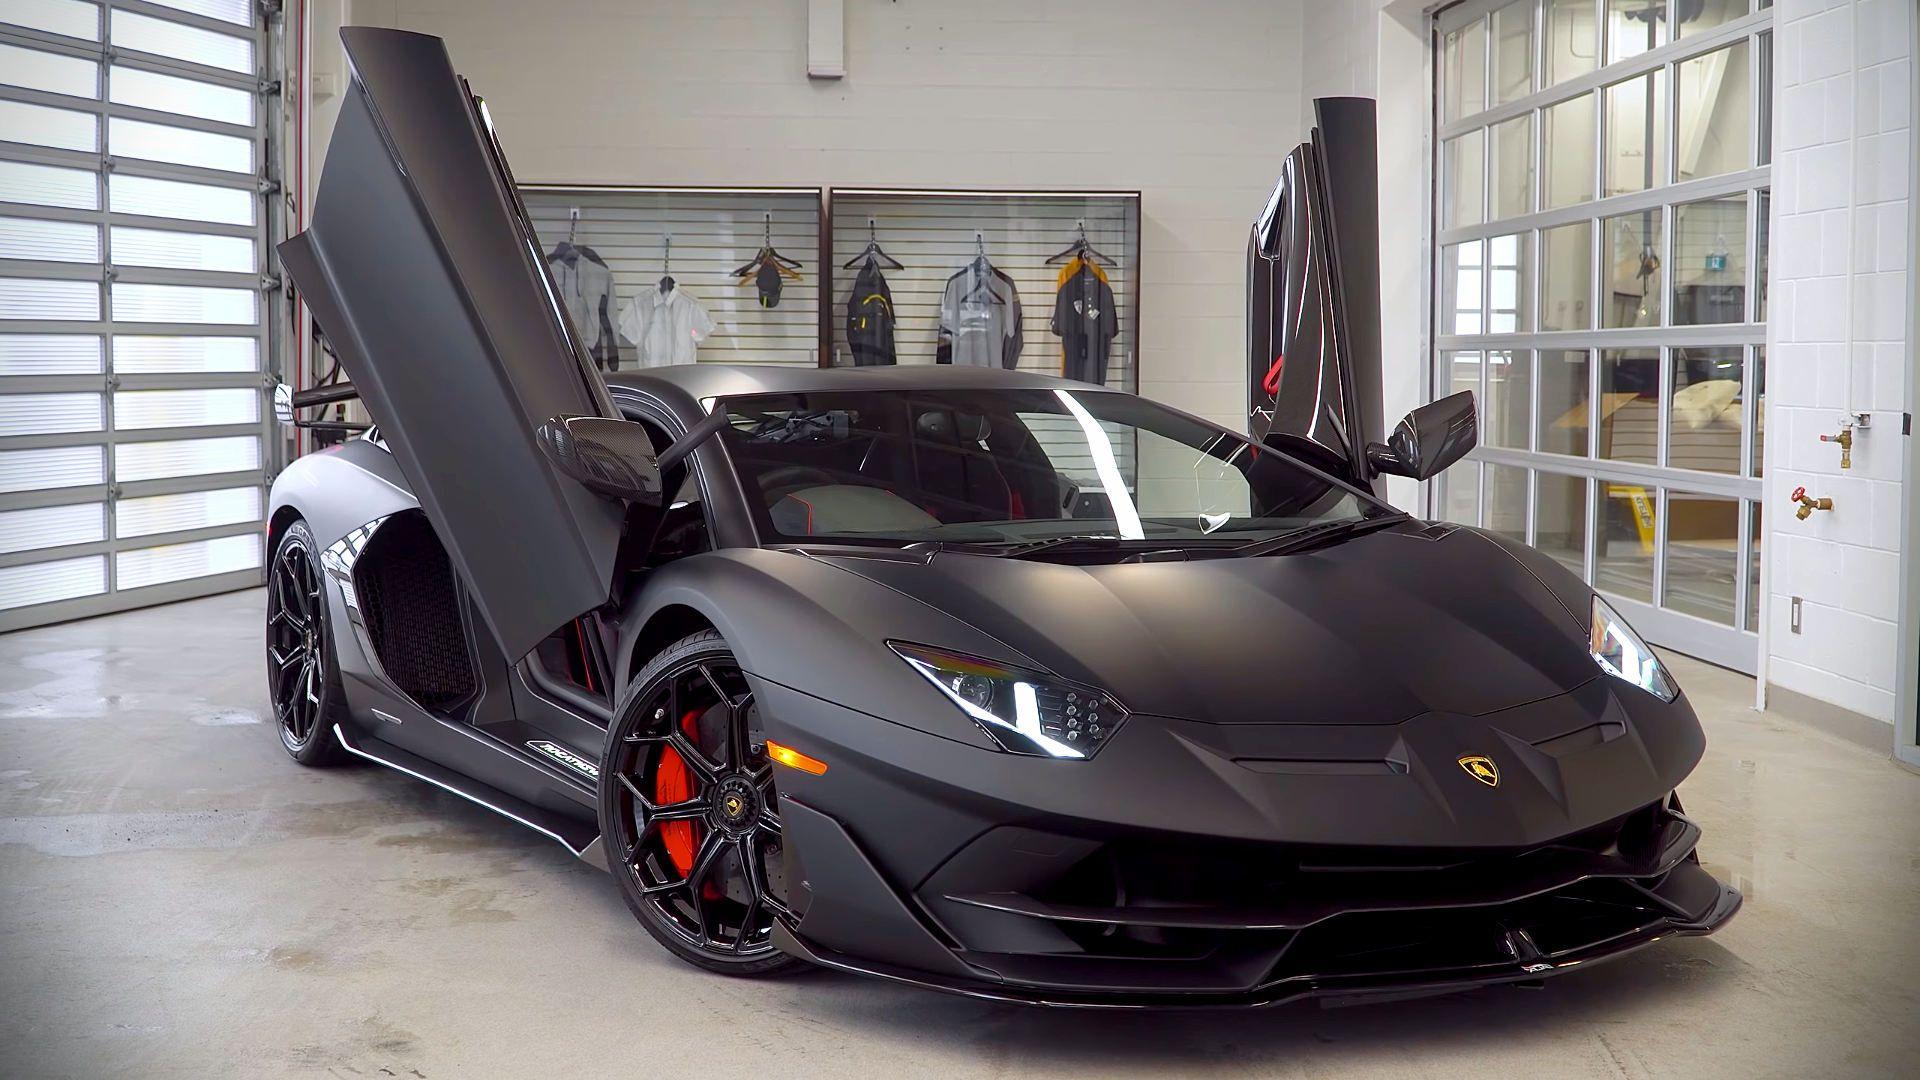 2019 Lamborghini Aventador Svj Black Luxury Sports Cars Lamborghini Aventador Mobil Mewah